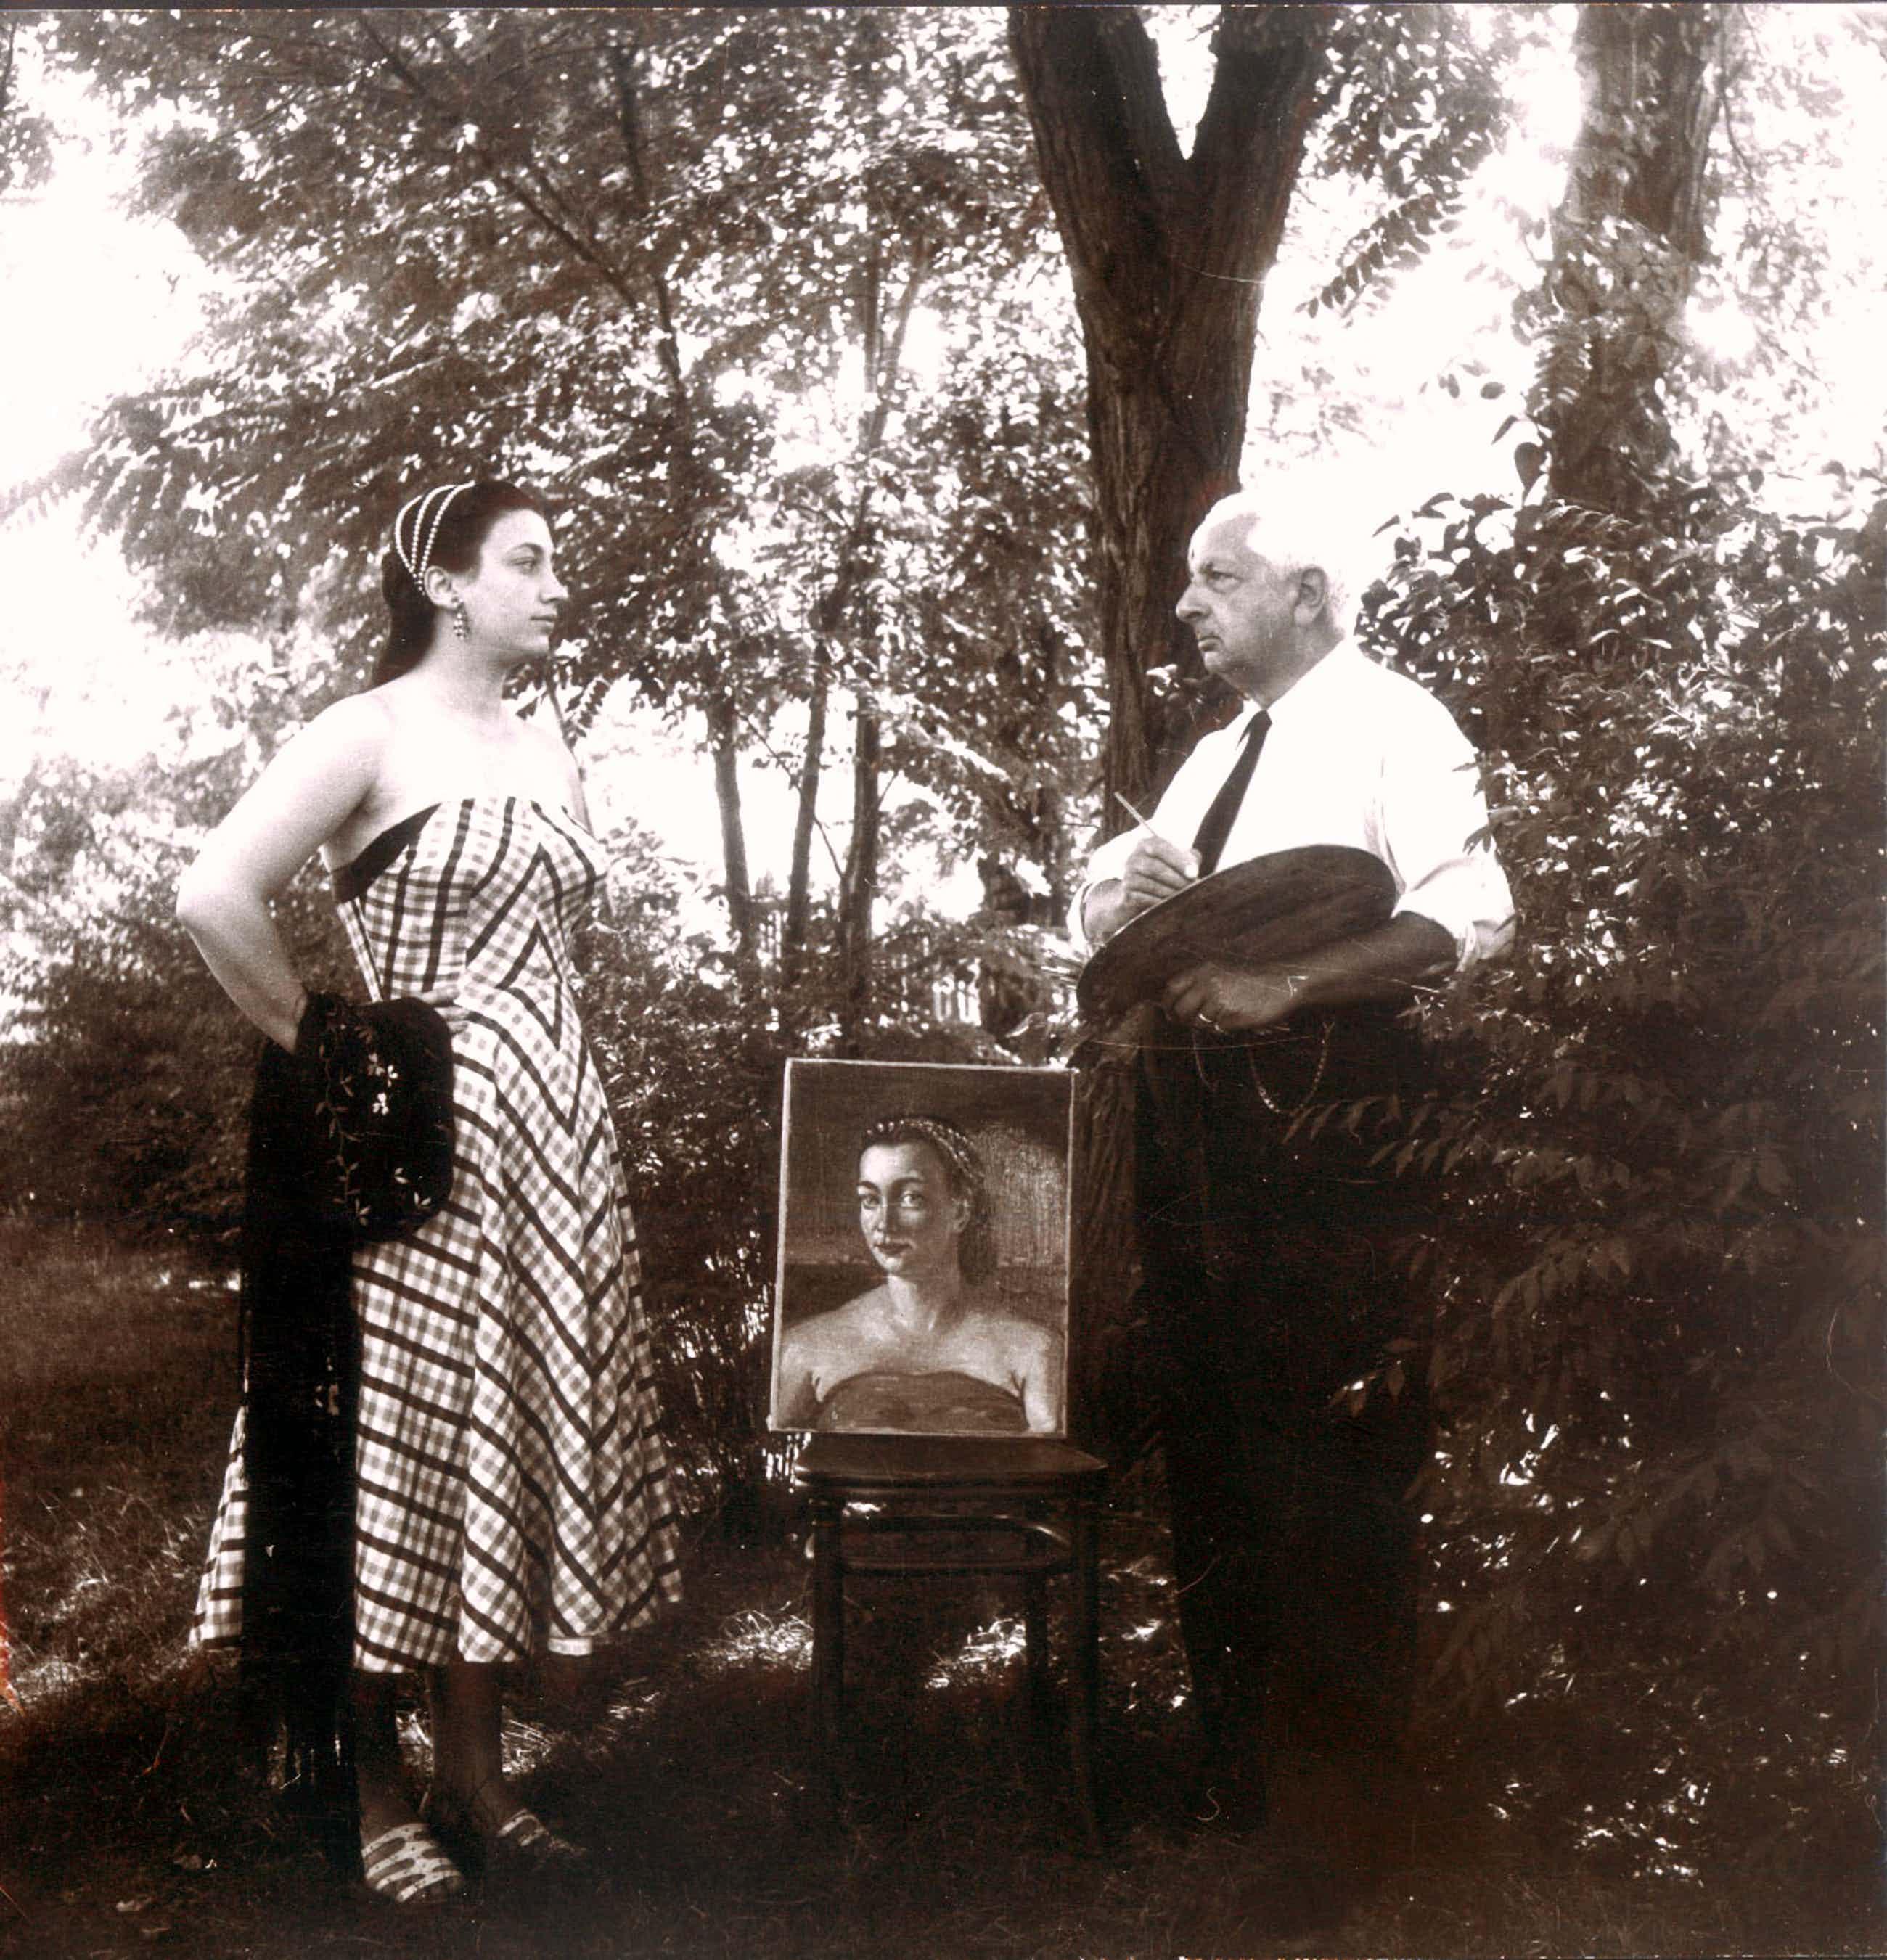 Boris Lipnitzki - Giorgio de Chirico im Garten mit Modell kopen? Bied vanaf 520!